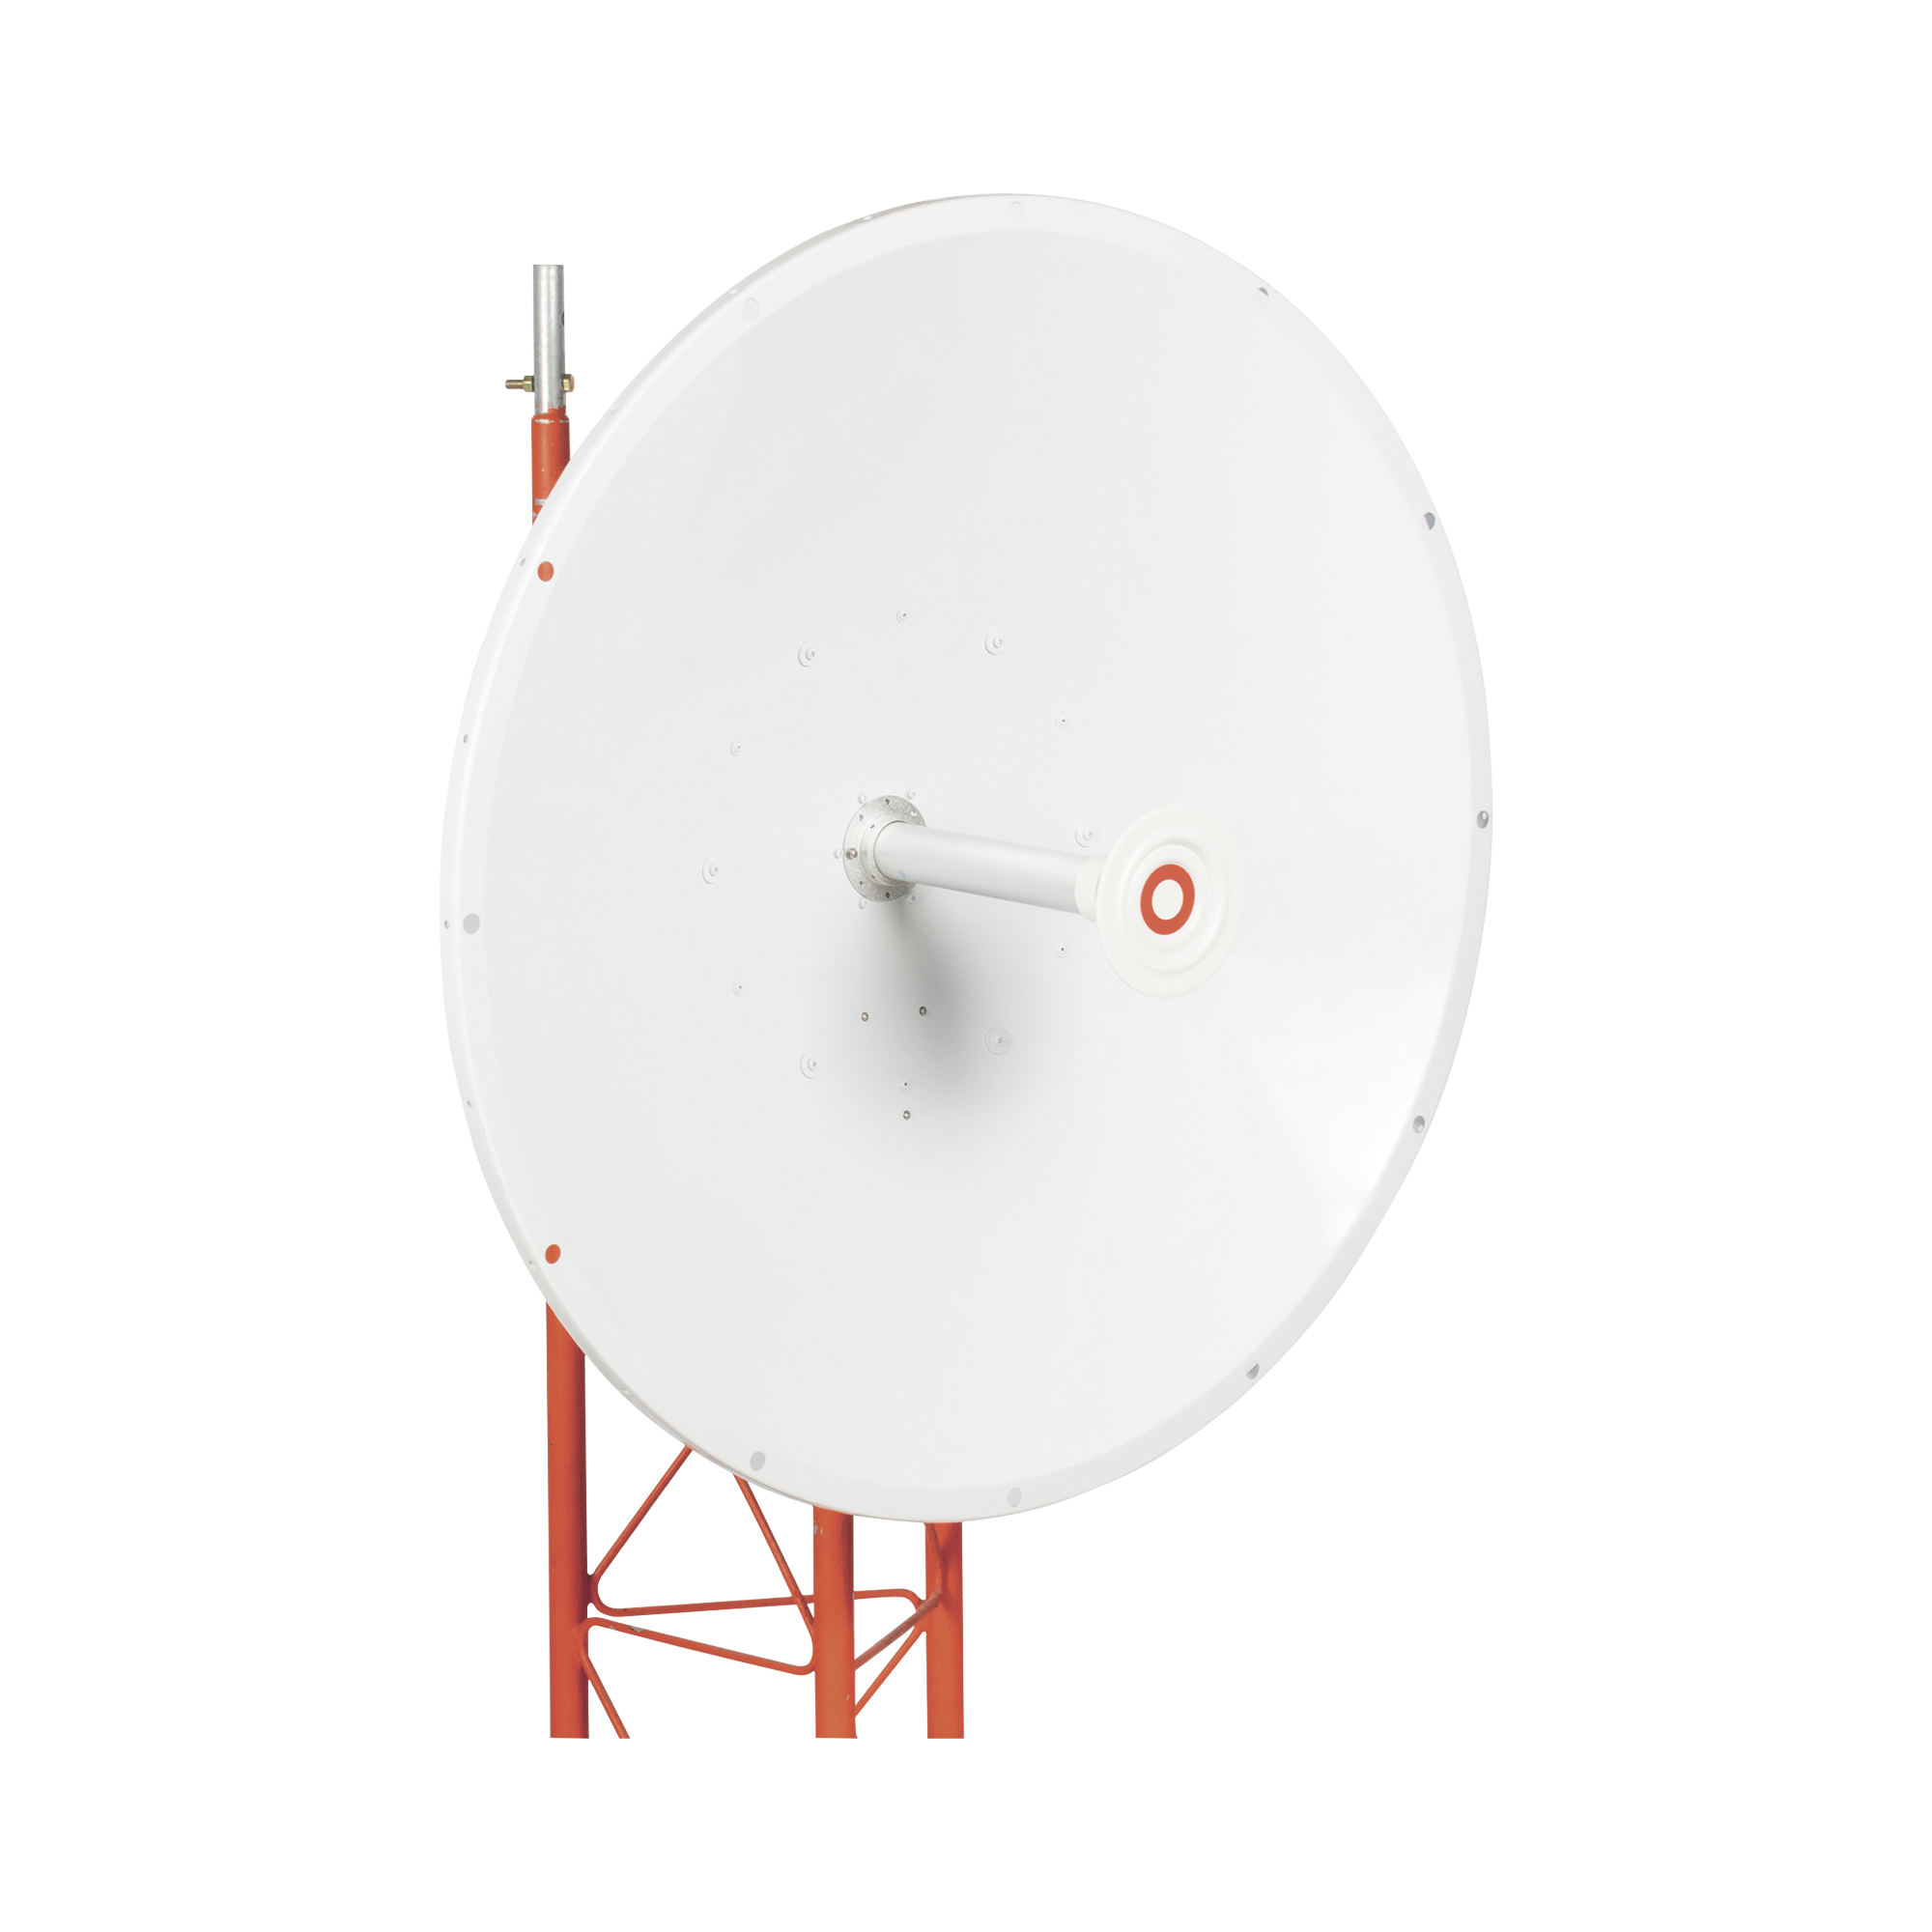 Antena direccional, Ganancia de 34 dBi, rango de frecuencia (4.9 - 6.5 GHz), Conectores N-hembra, Polarización doble, incluye montaje para torre o mástil